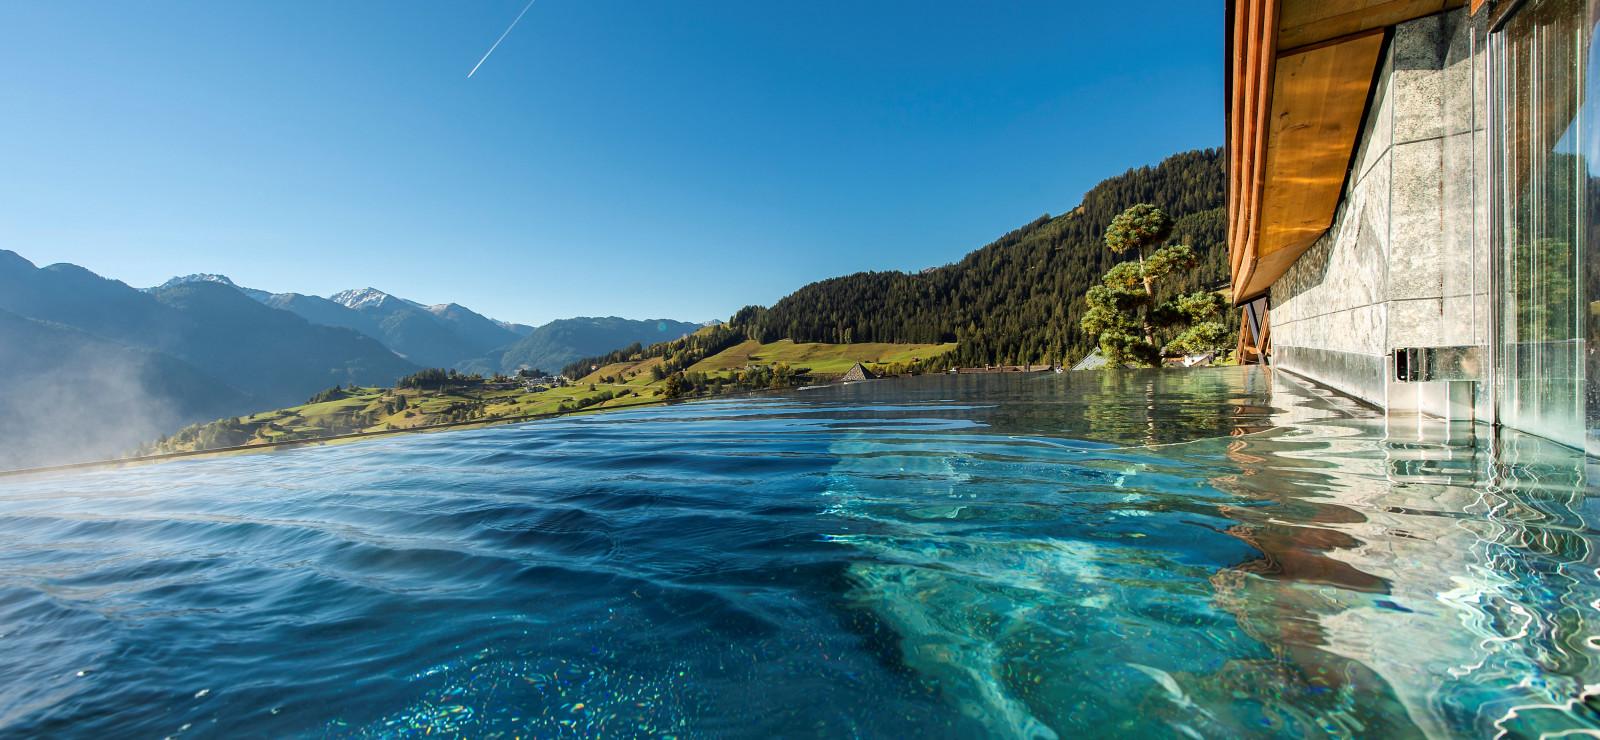 Hotel Tirol Bilder | Bild 1